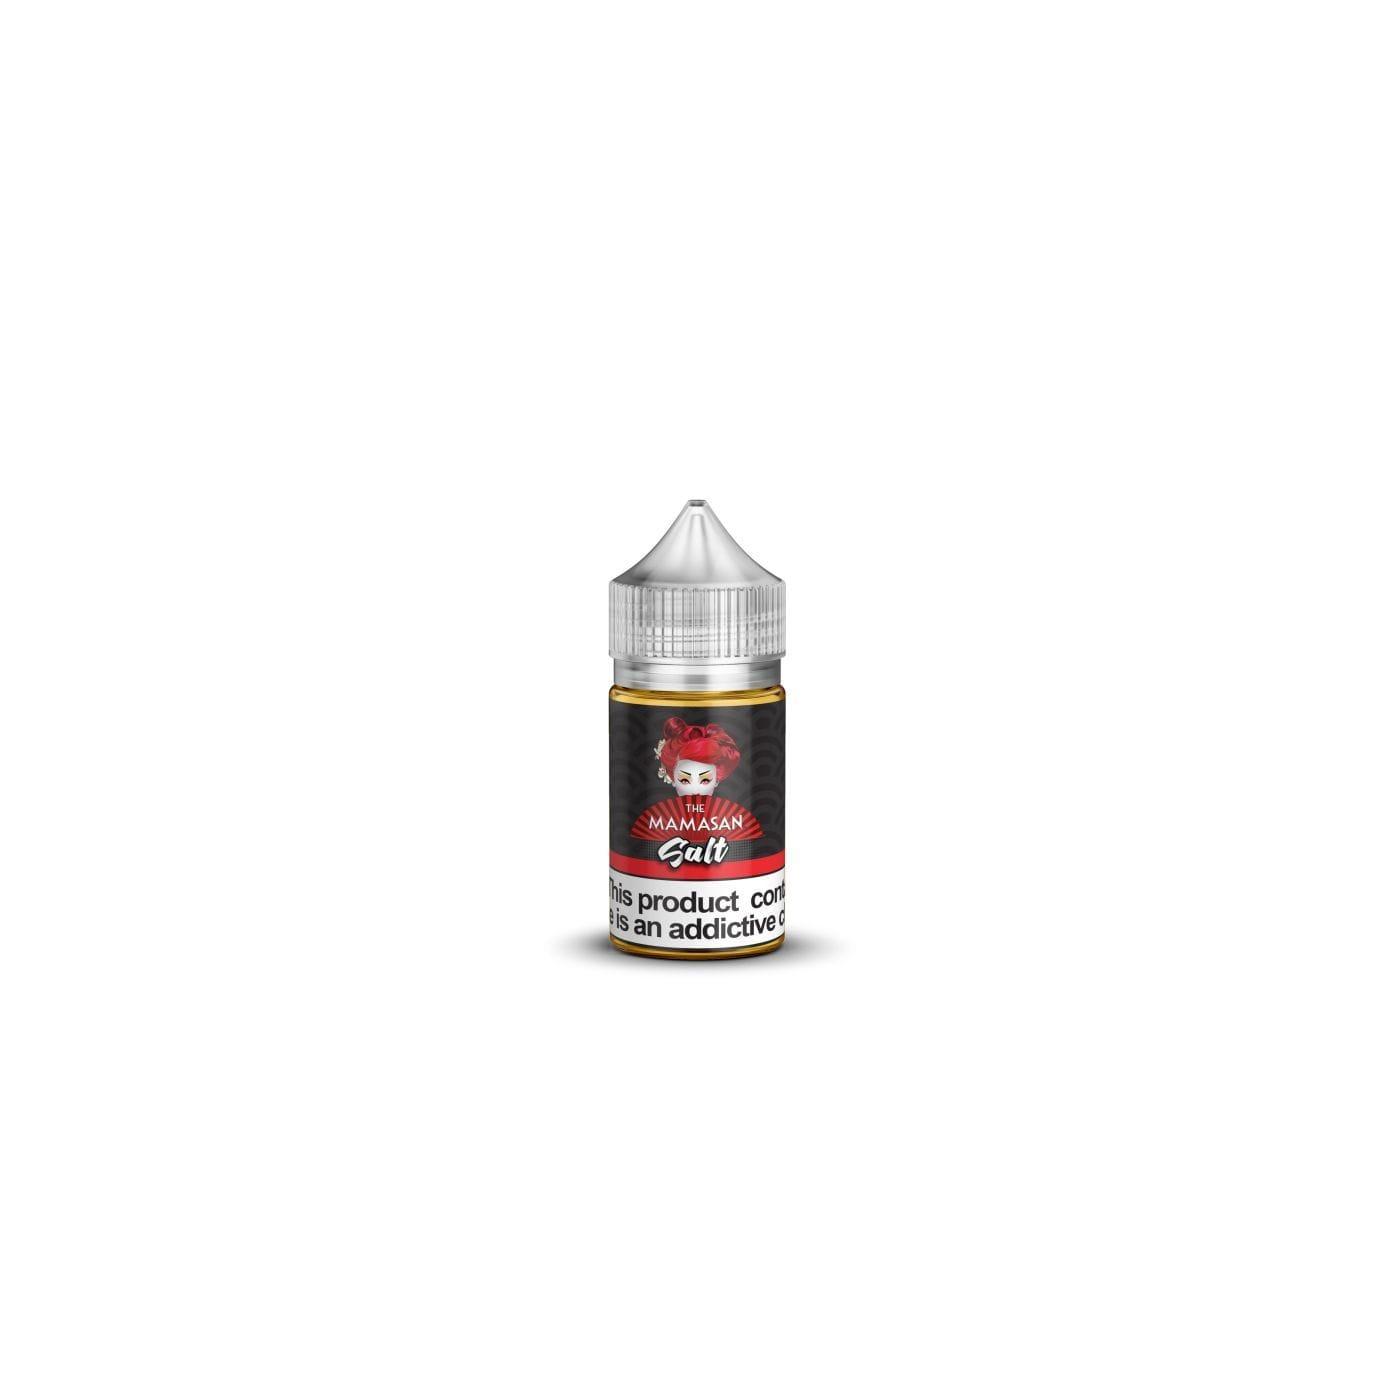 Bruce Leechee 30ml Salt E-liquid - The Mamasan Vape Juice